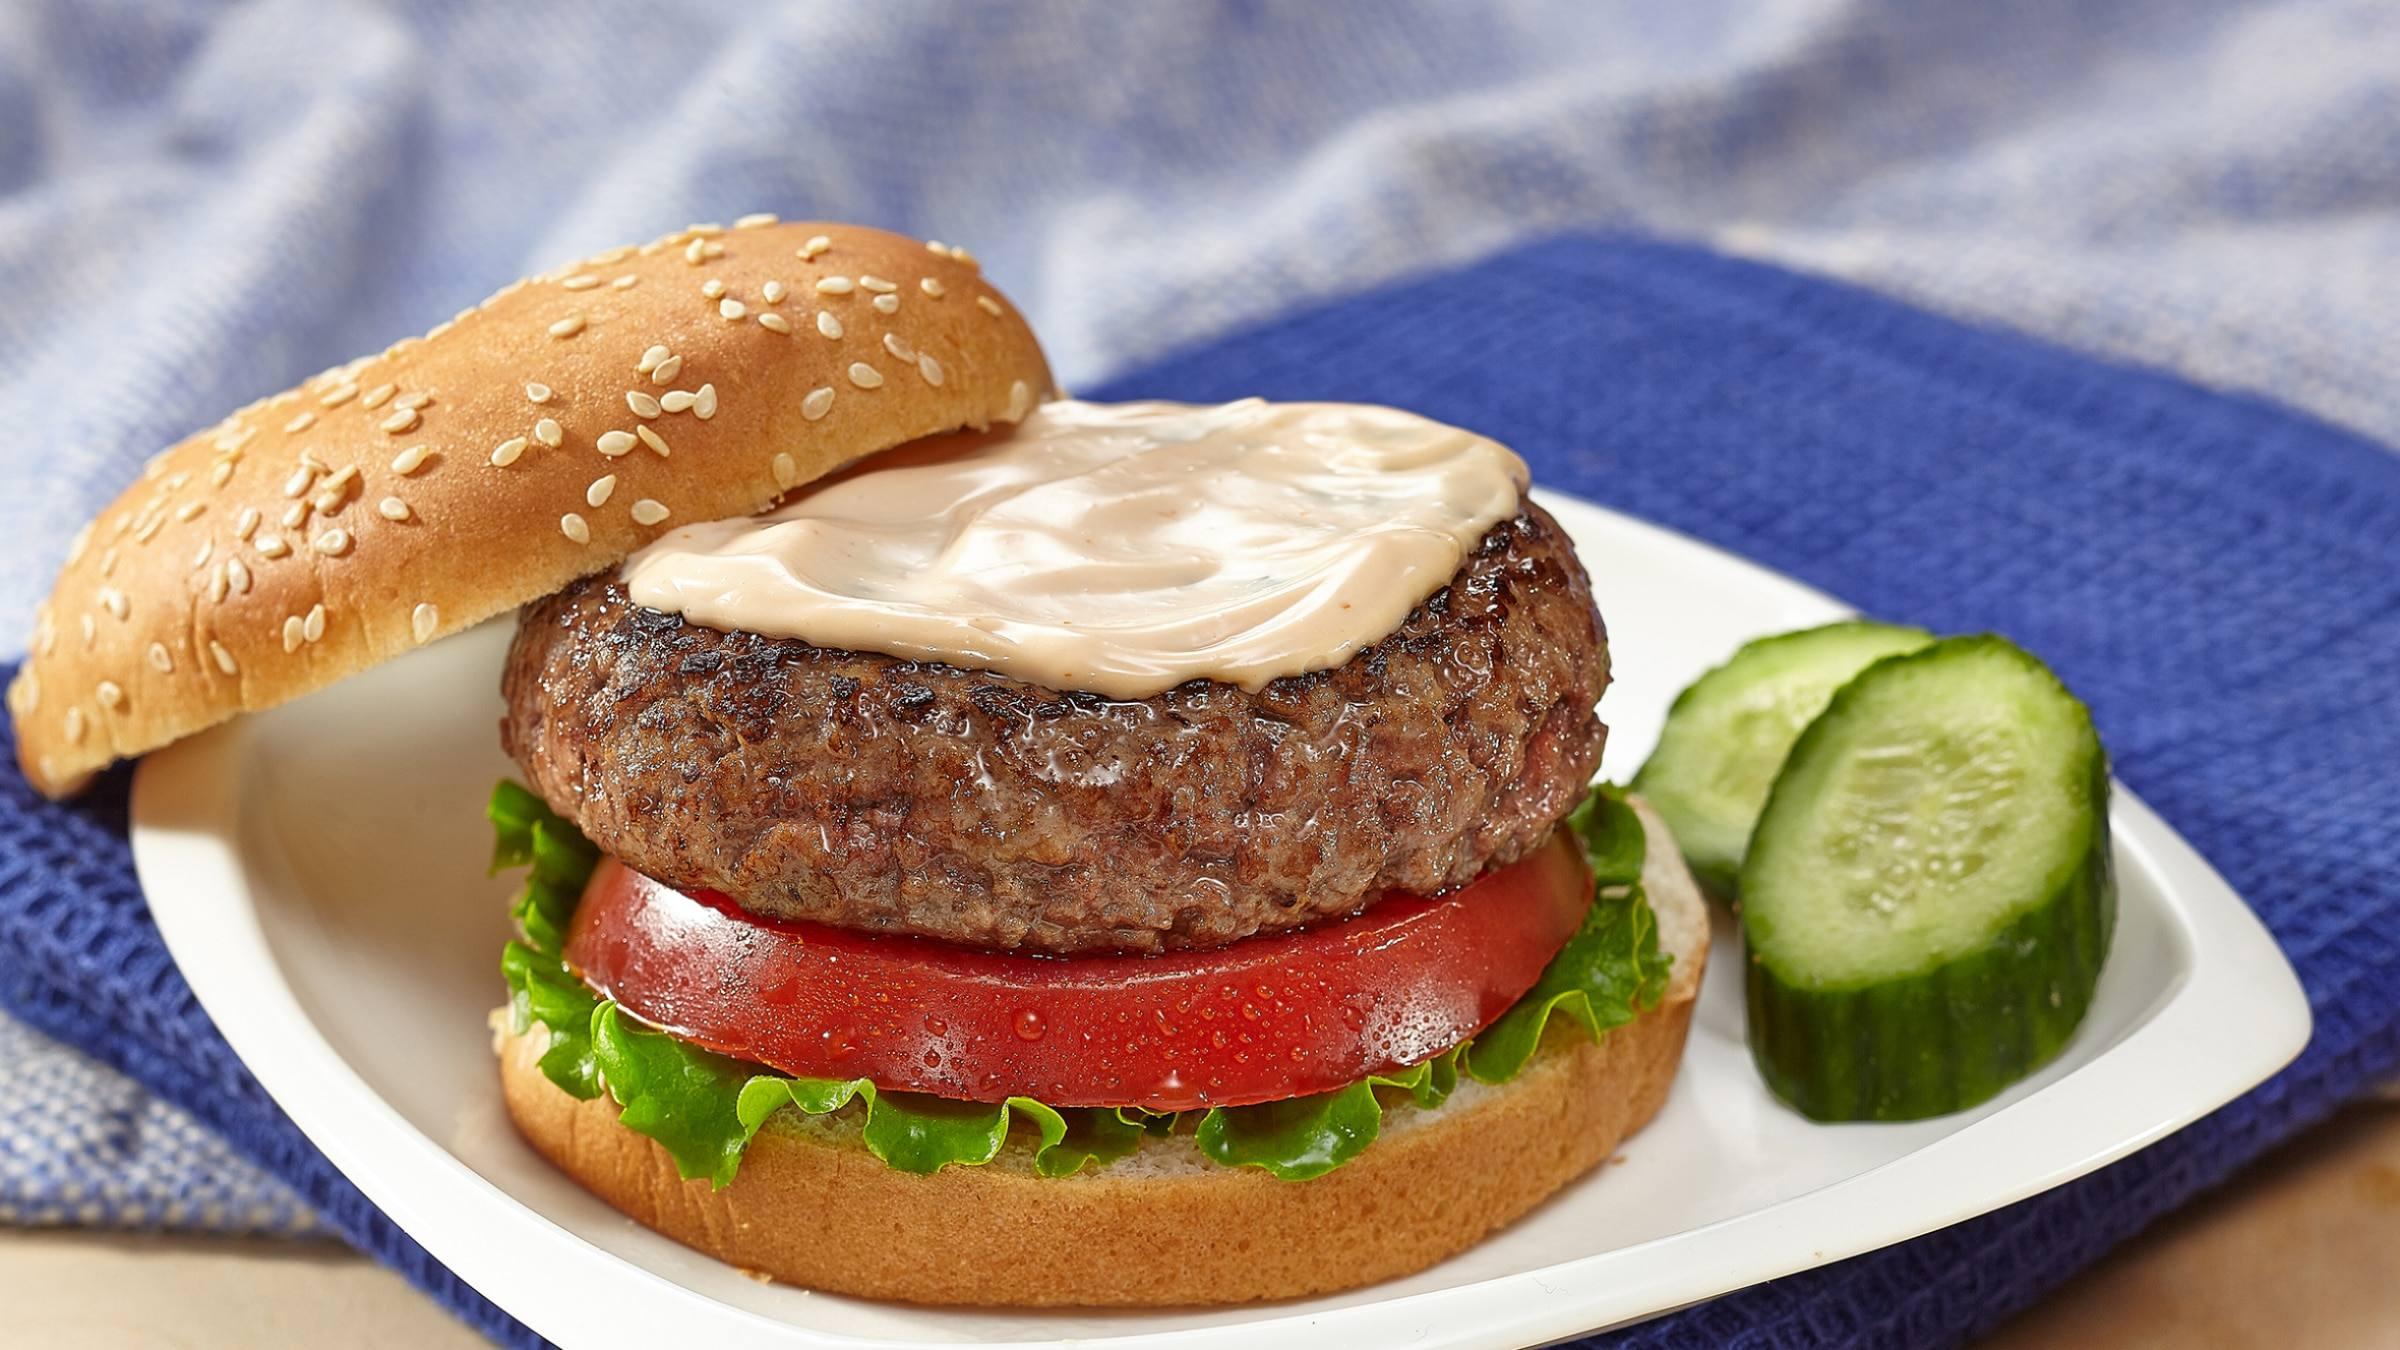 Juicy Burger with Creamy BBQ Sauce